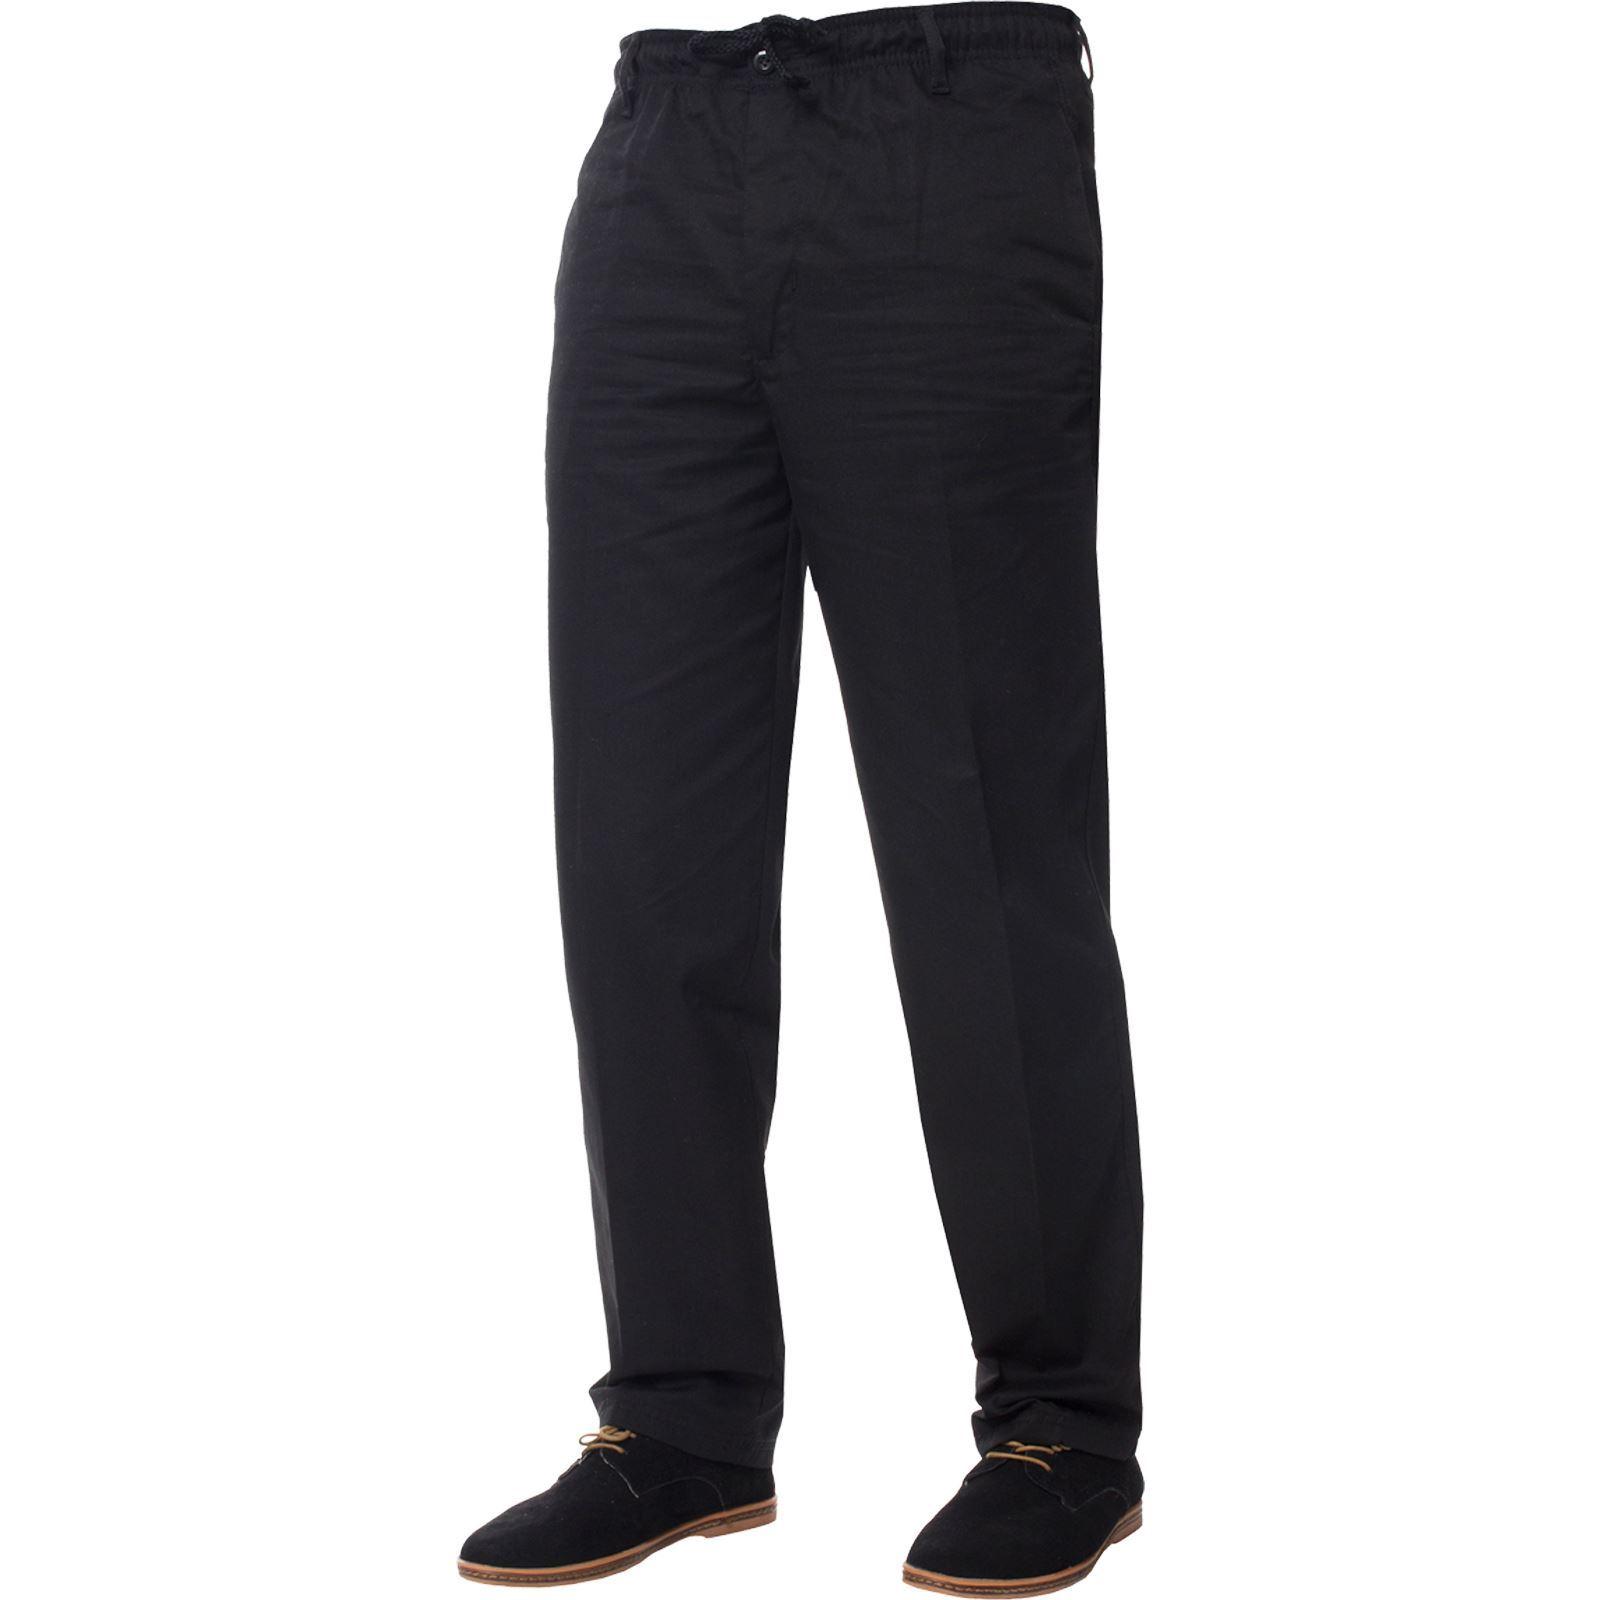 Para-Hombres-Pantalones-De-Rugby-Kruze-cintura-elastica-con-cordon-pantalones-REGULAR-King-Tamanos miniatura 5